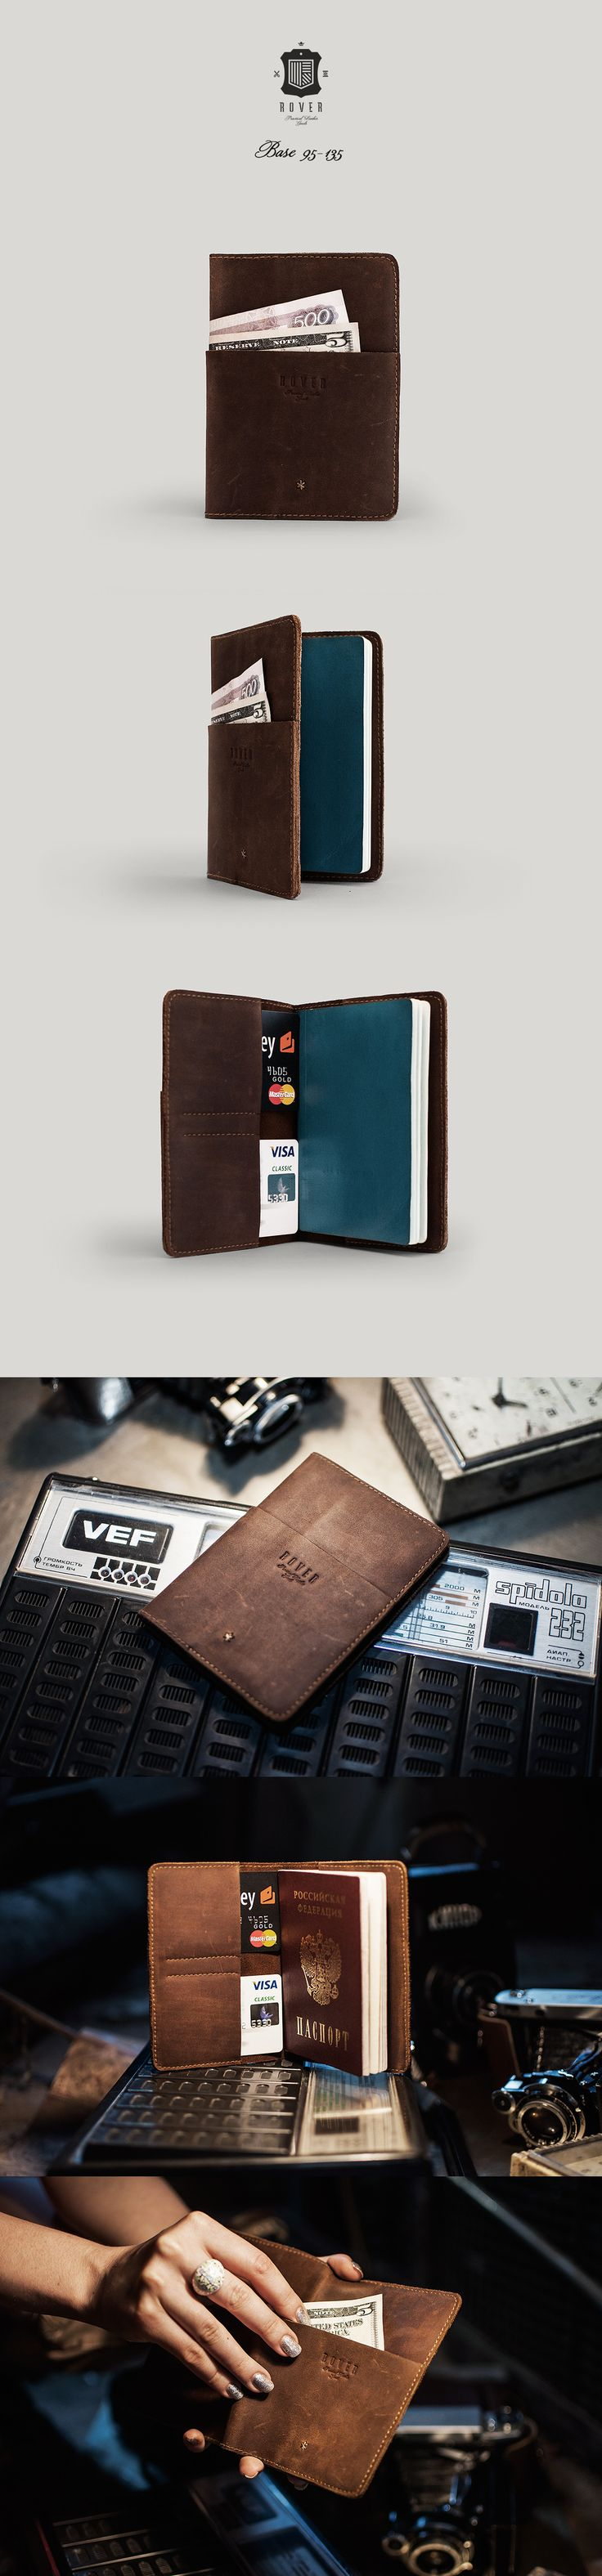 ROVER Base 95-135 Passport Wallet